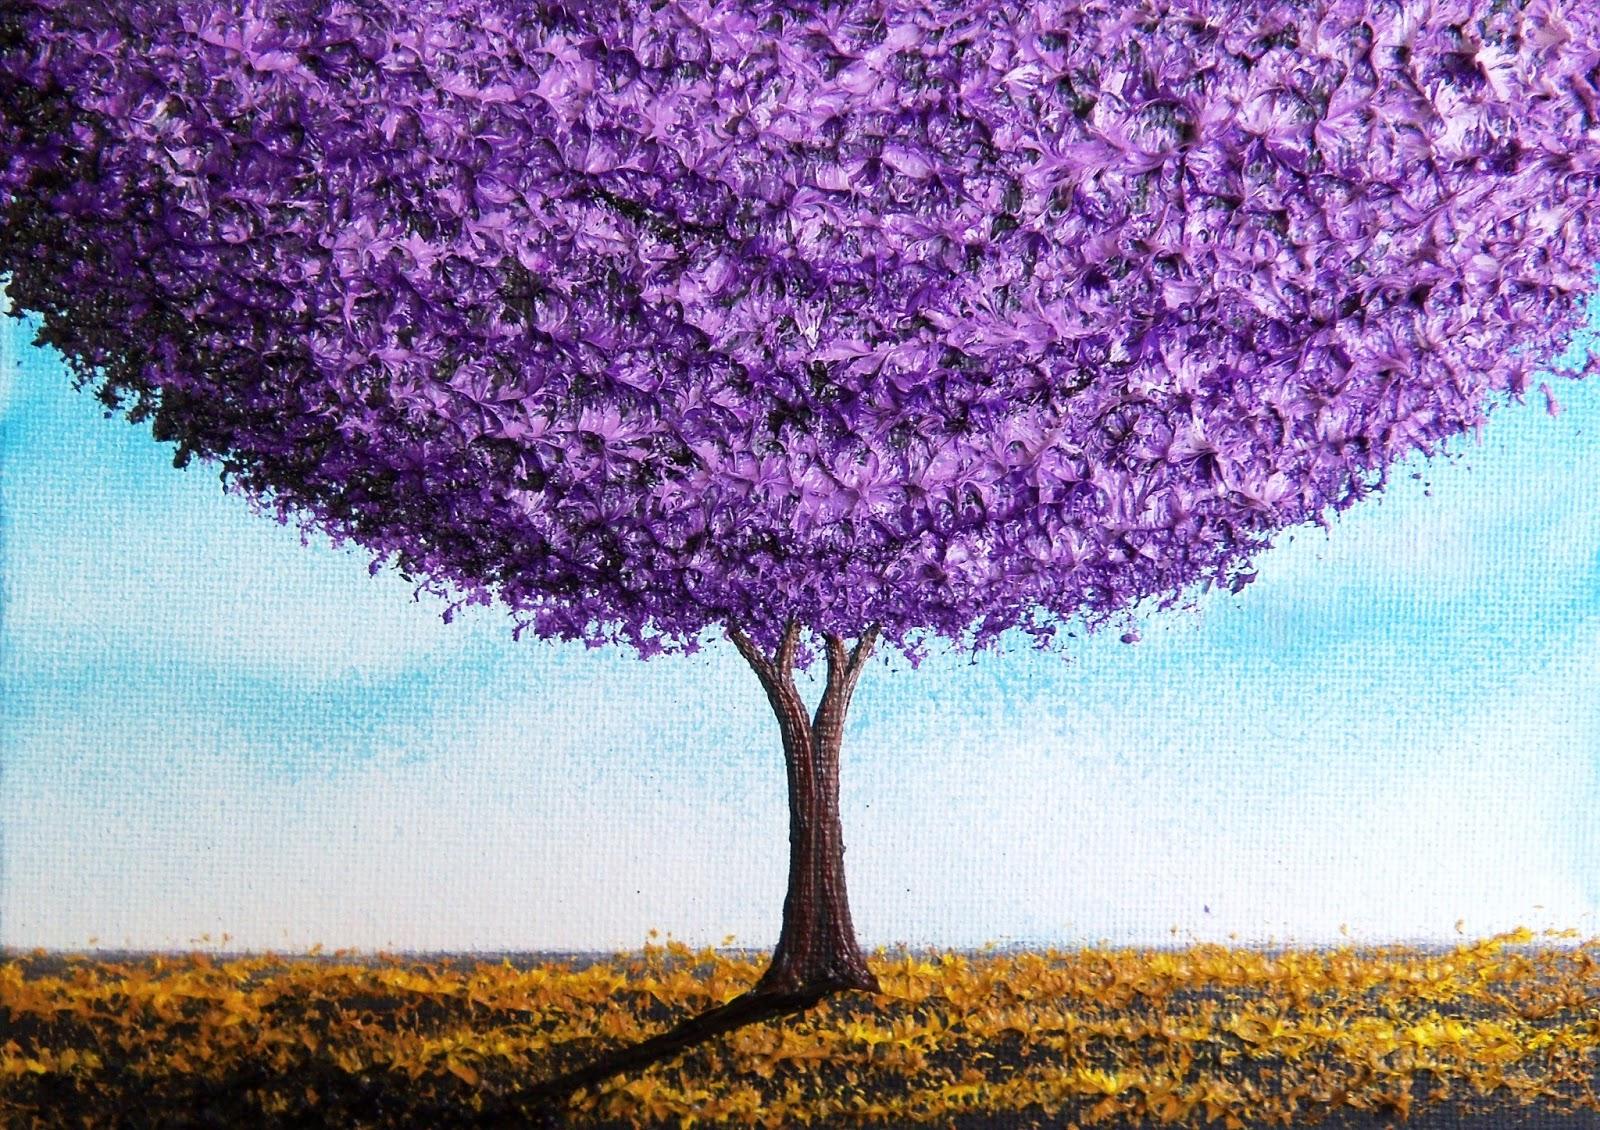 Purple Tree Landscape Painting Abstract on Sunflower Craft Ideas 5